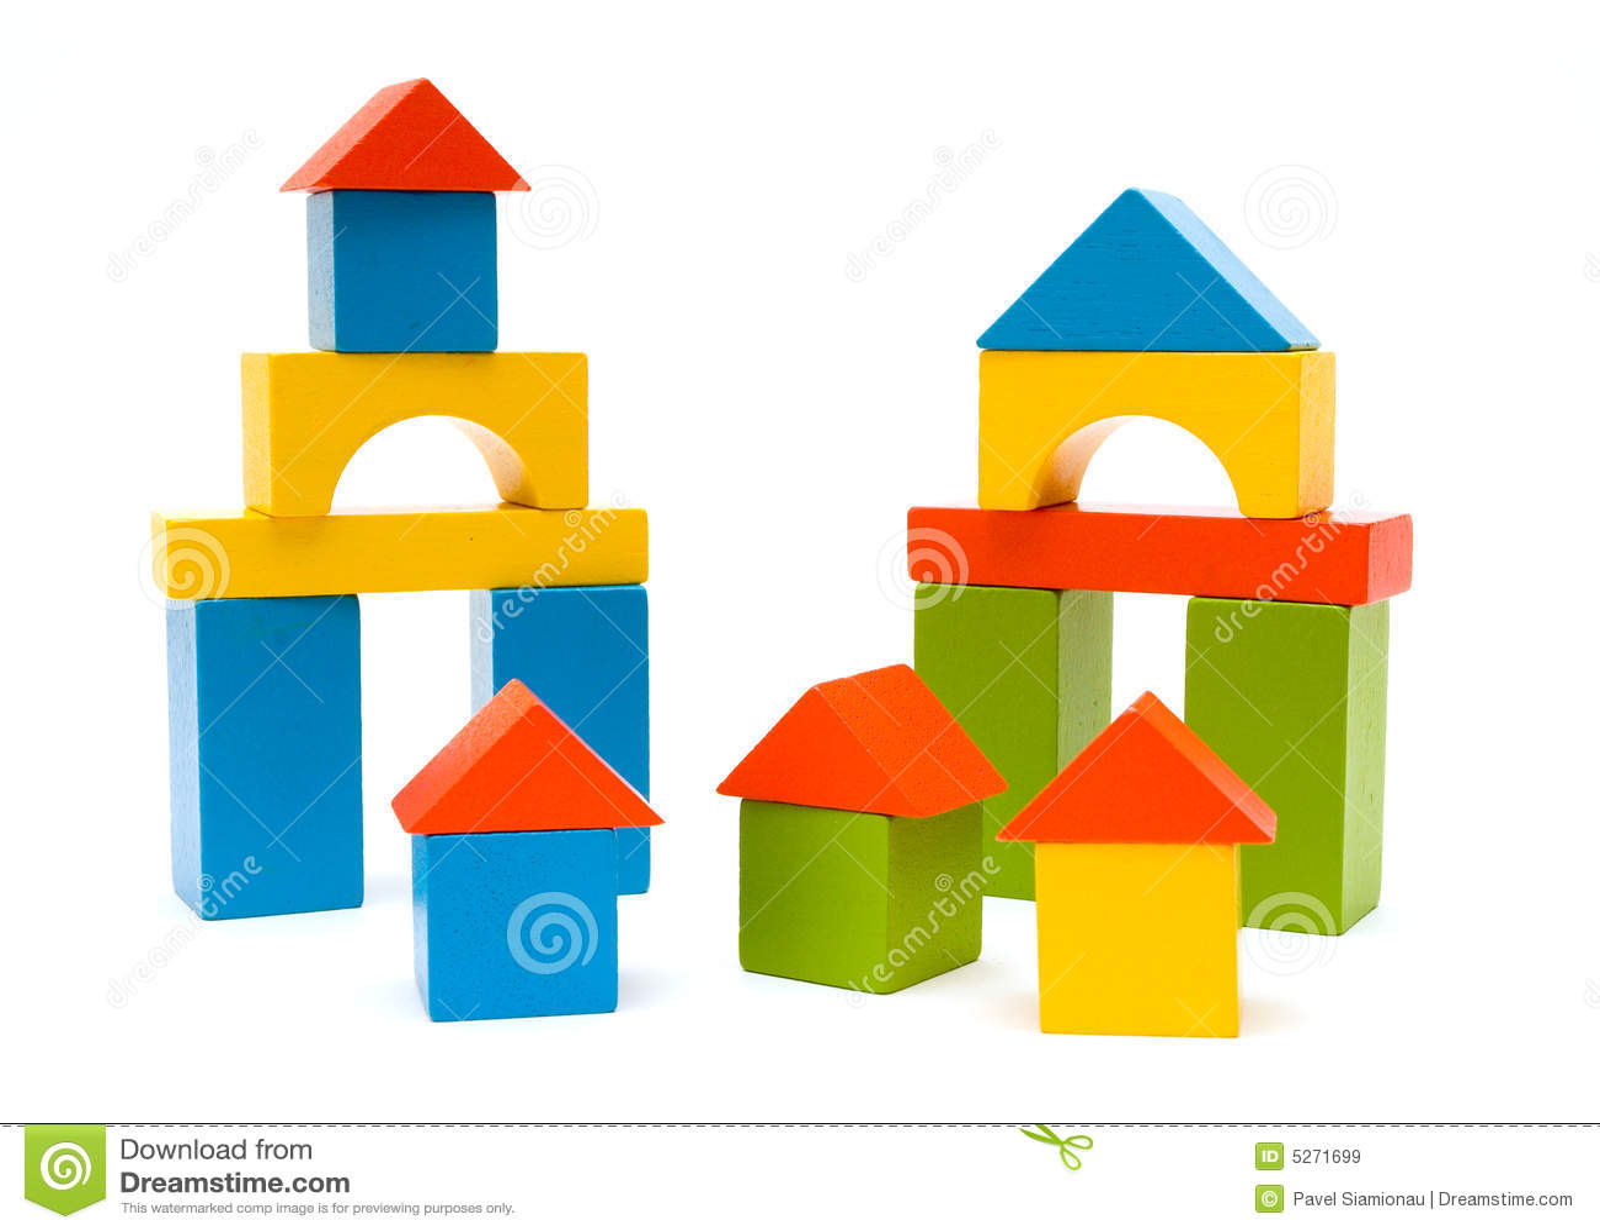 Toy Blocks Royalty Free Stock Images - Image: 5271699